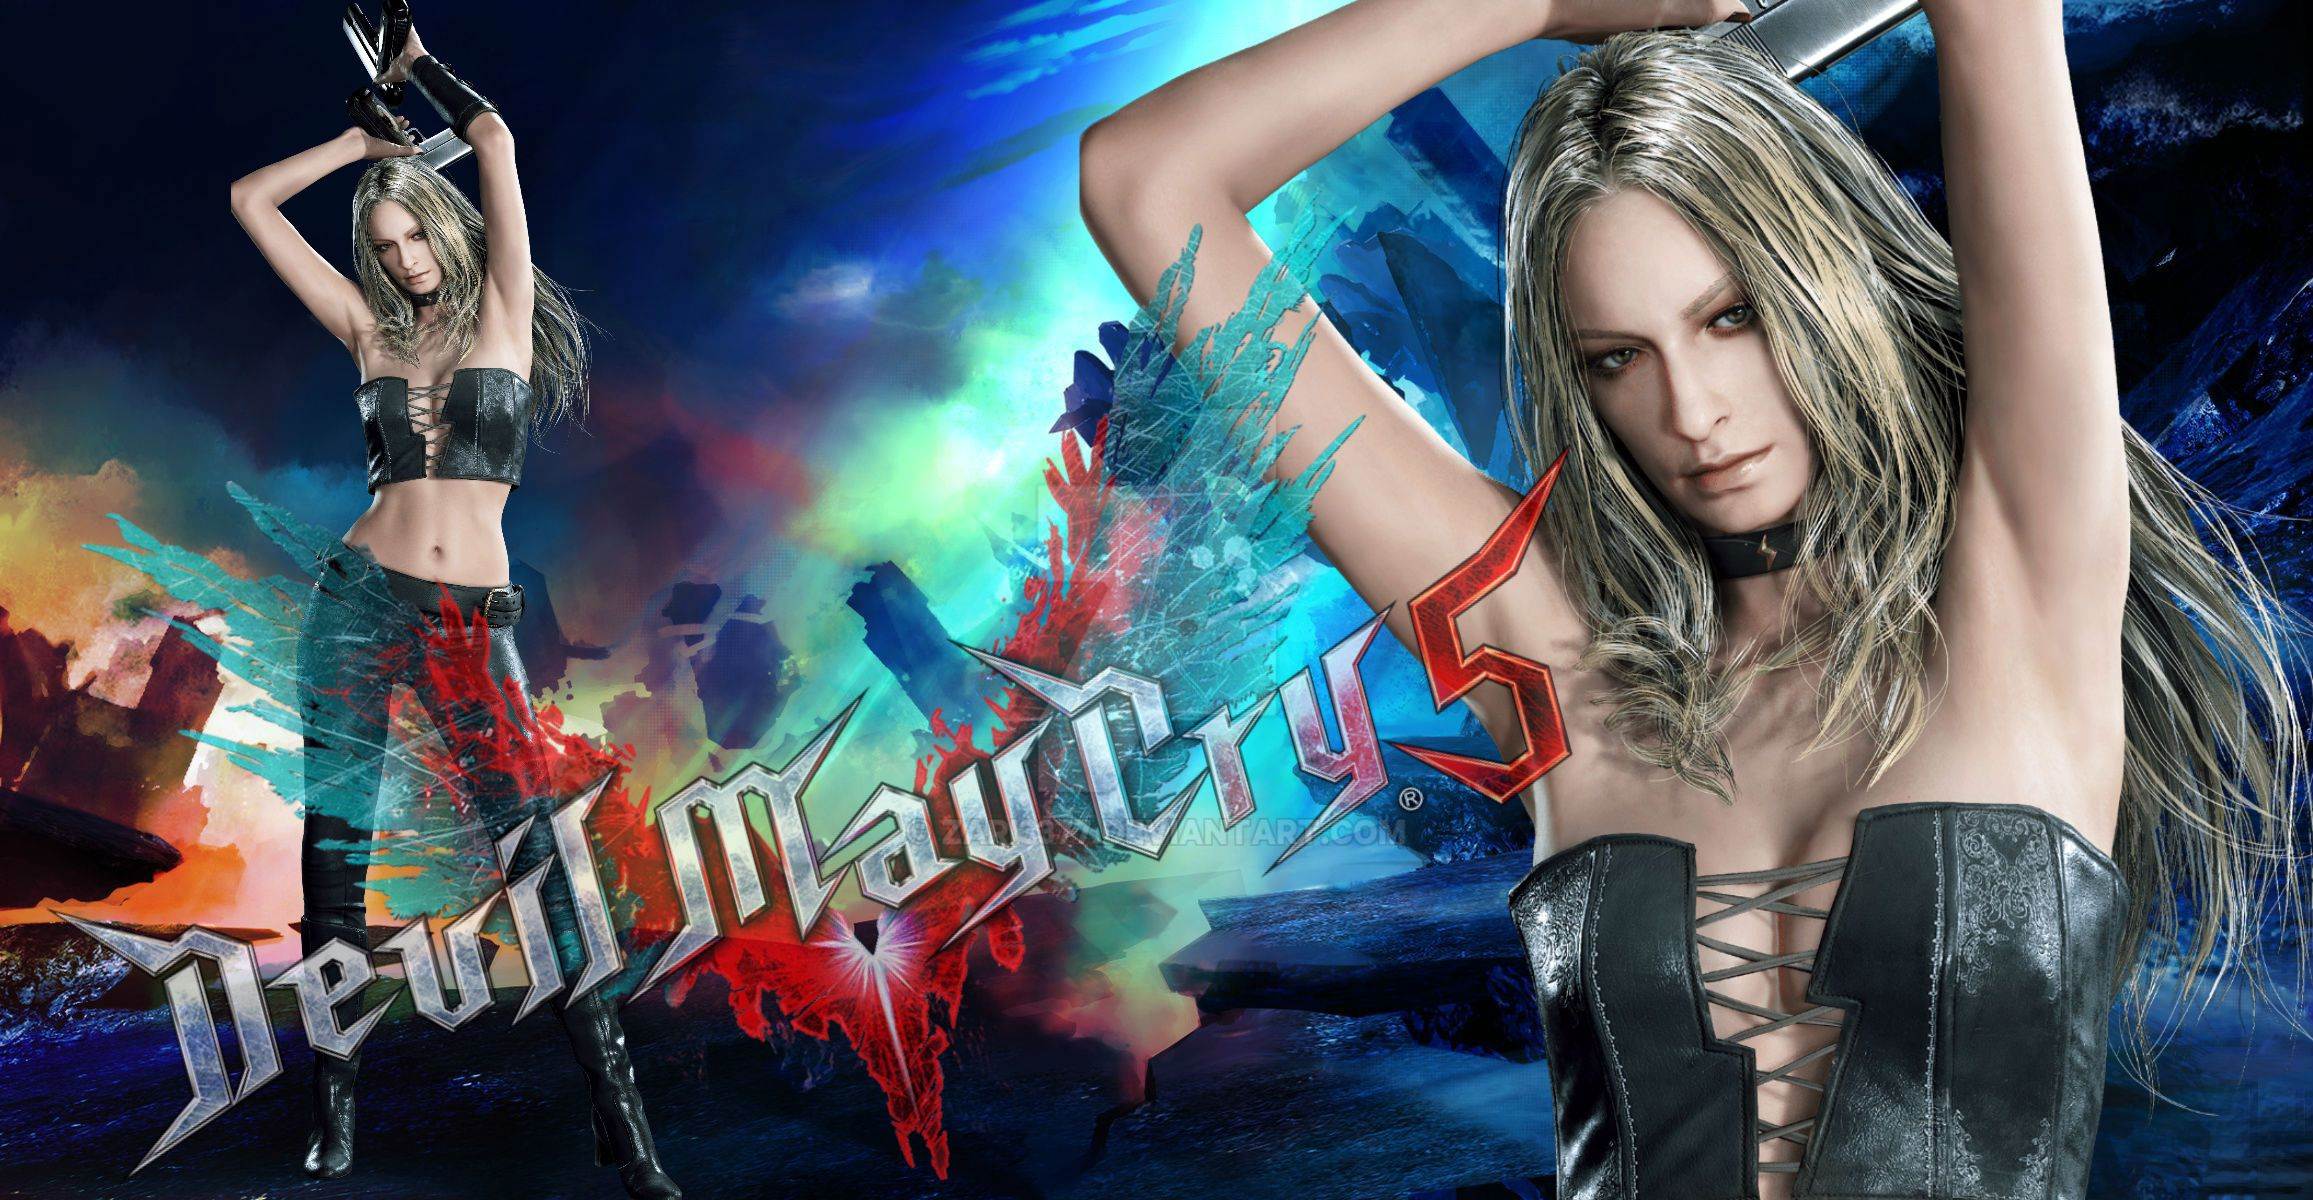 Lady versus Trish by cosplayerotica on DeviantArt